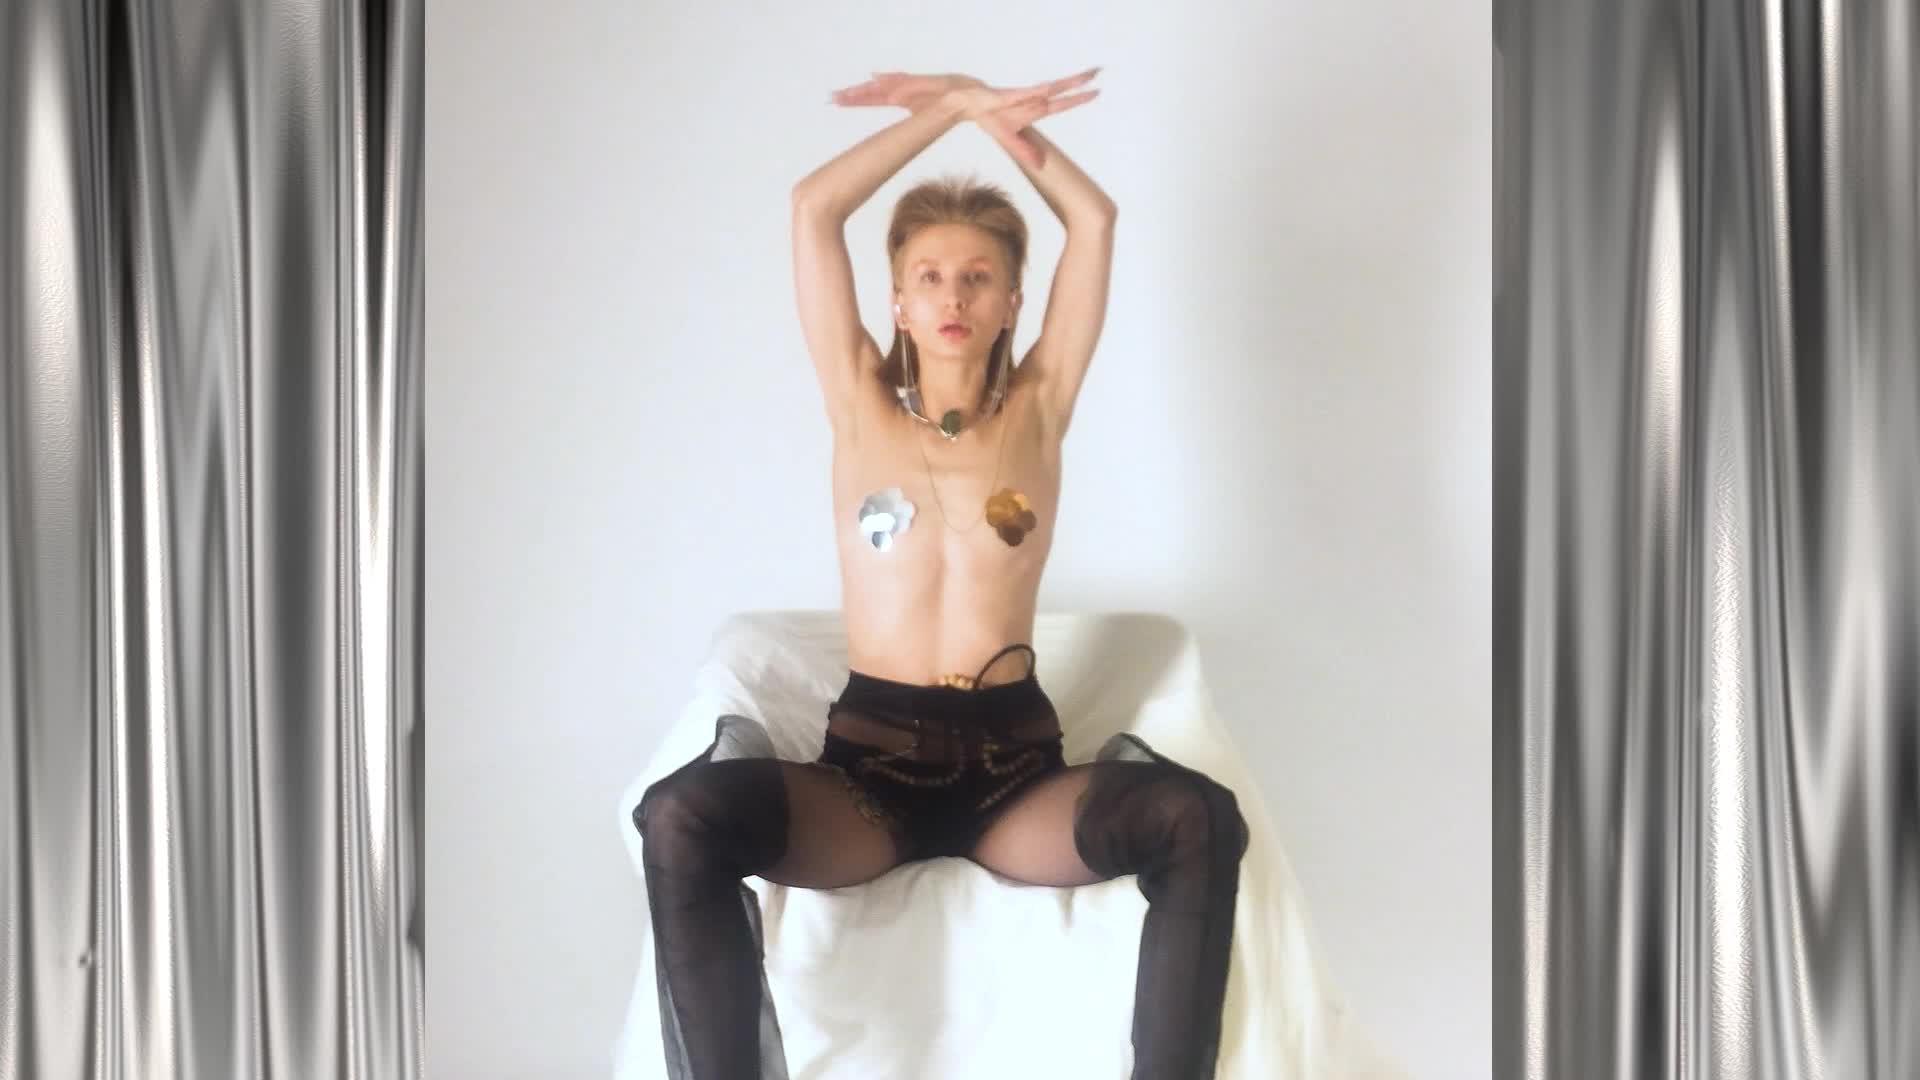 Lindsay lohan nude oops